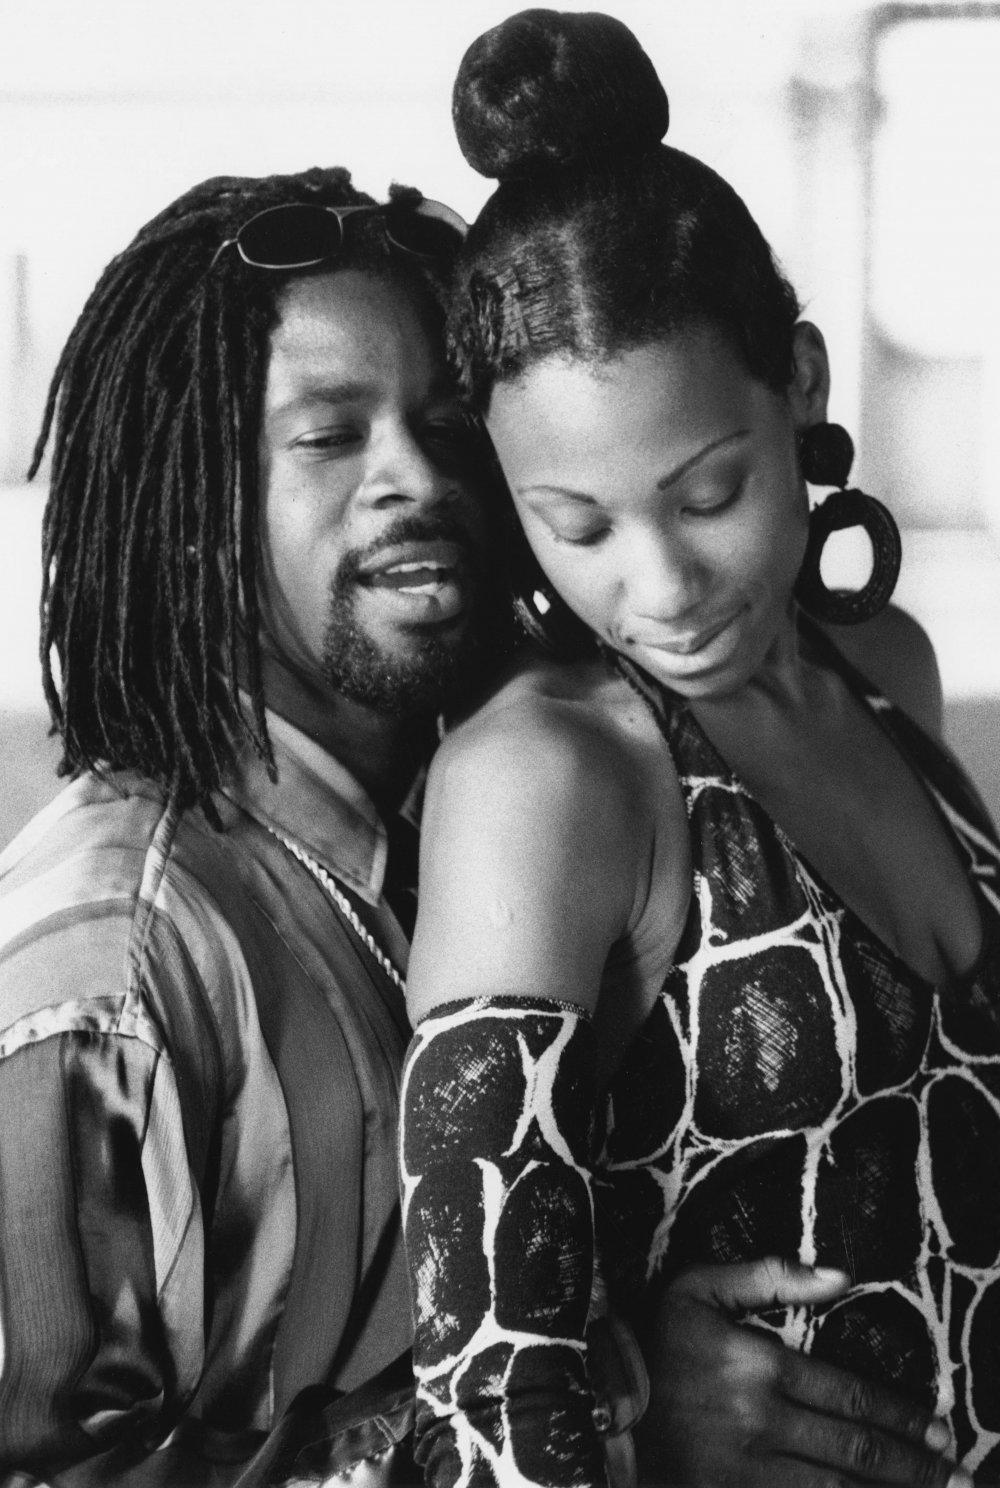 Anita with her husband Byron (Wil Johnson)